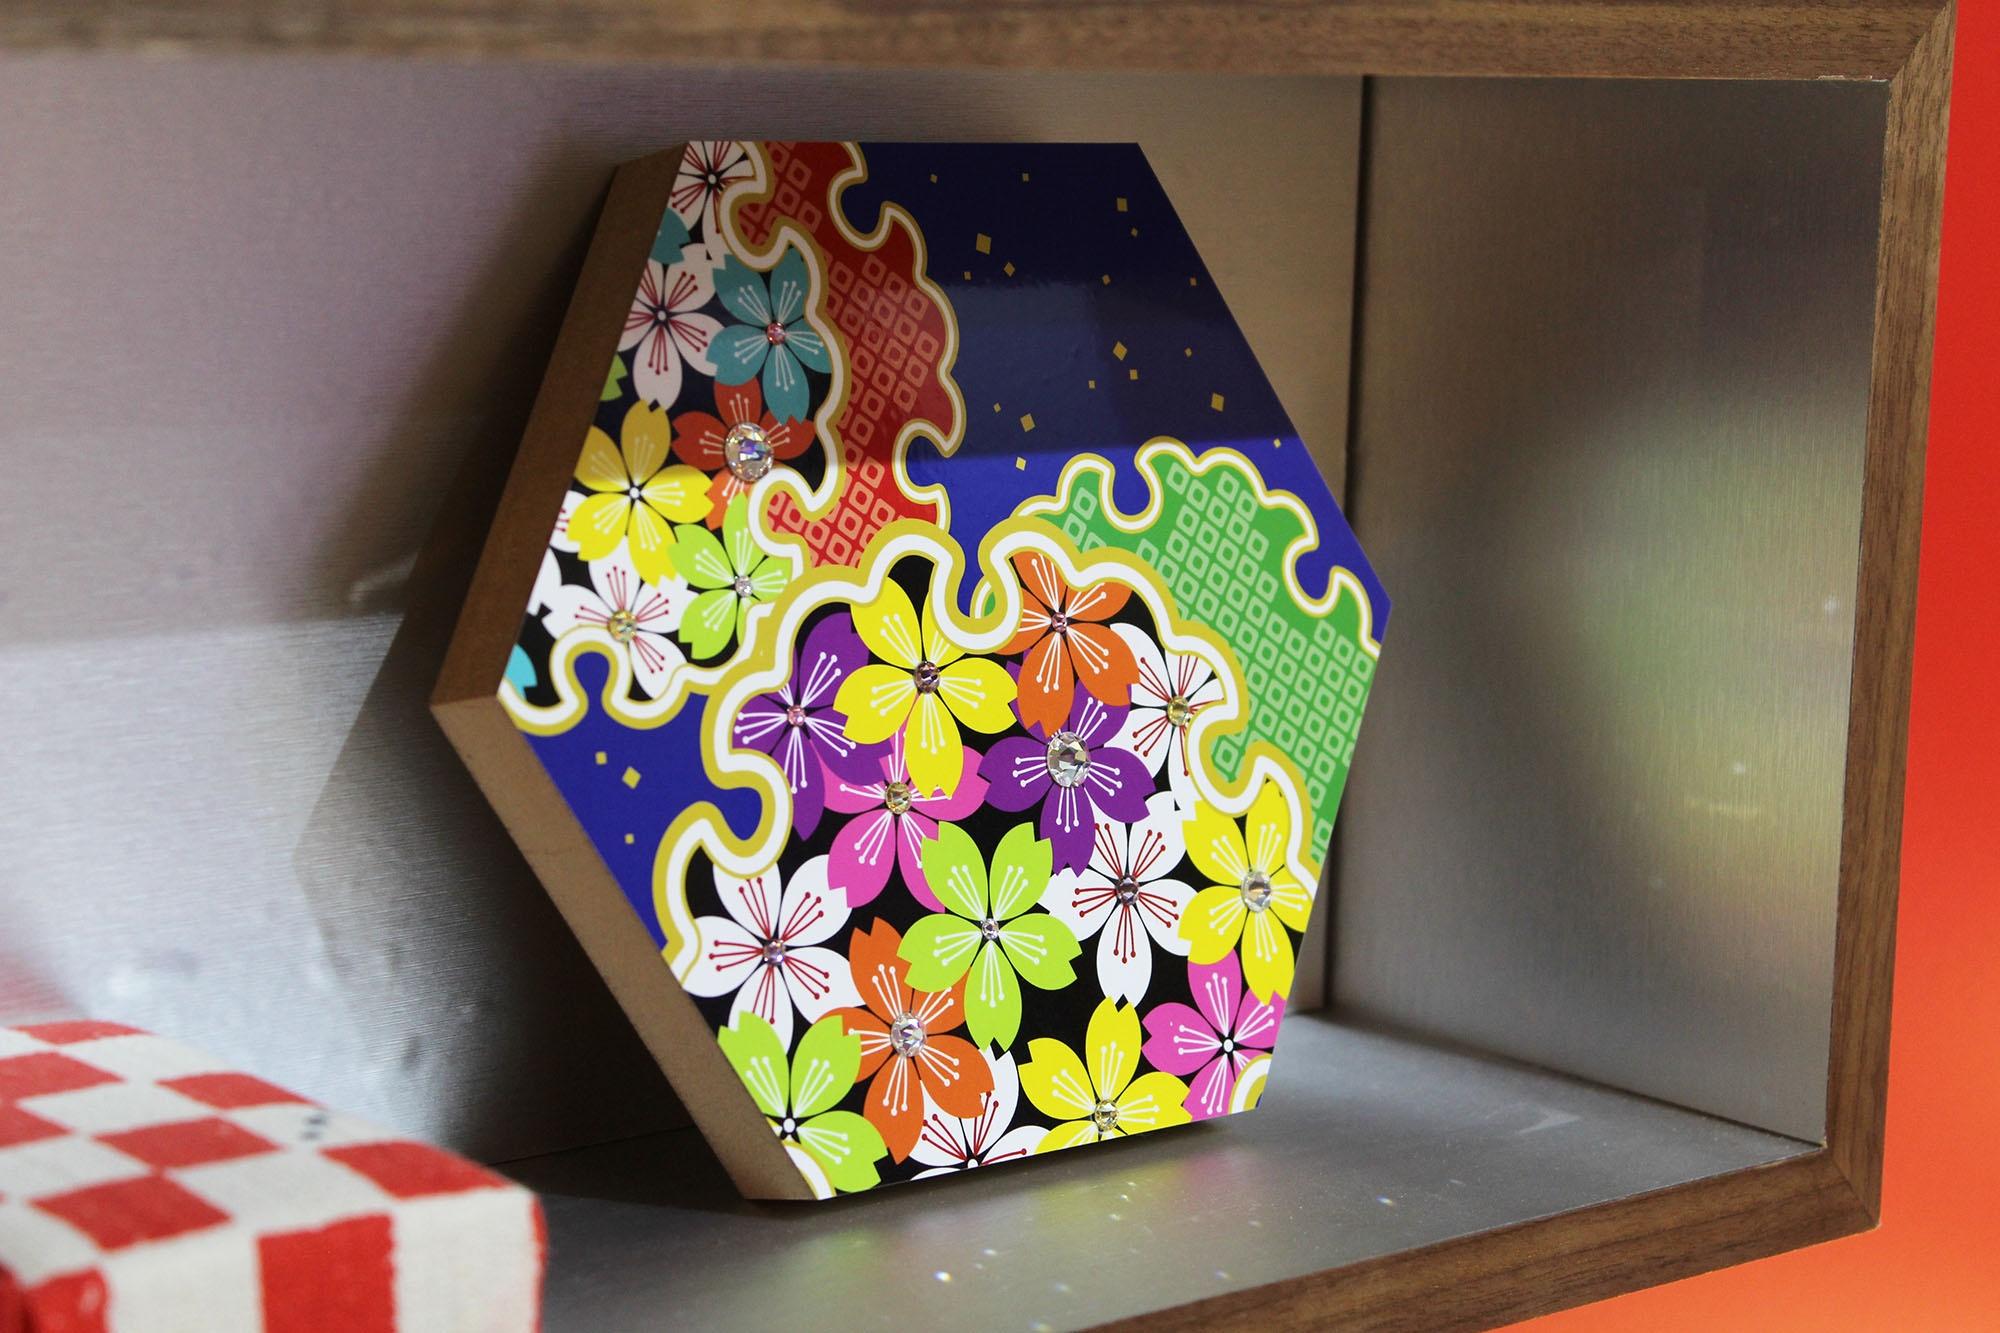 Hexangular decorative board